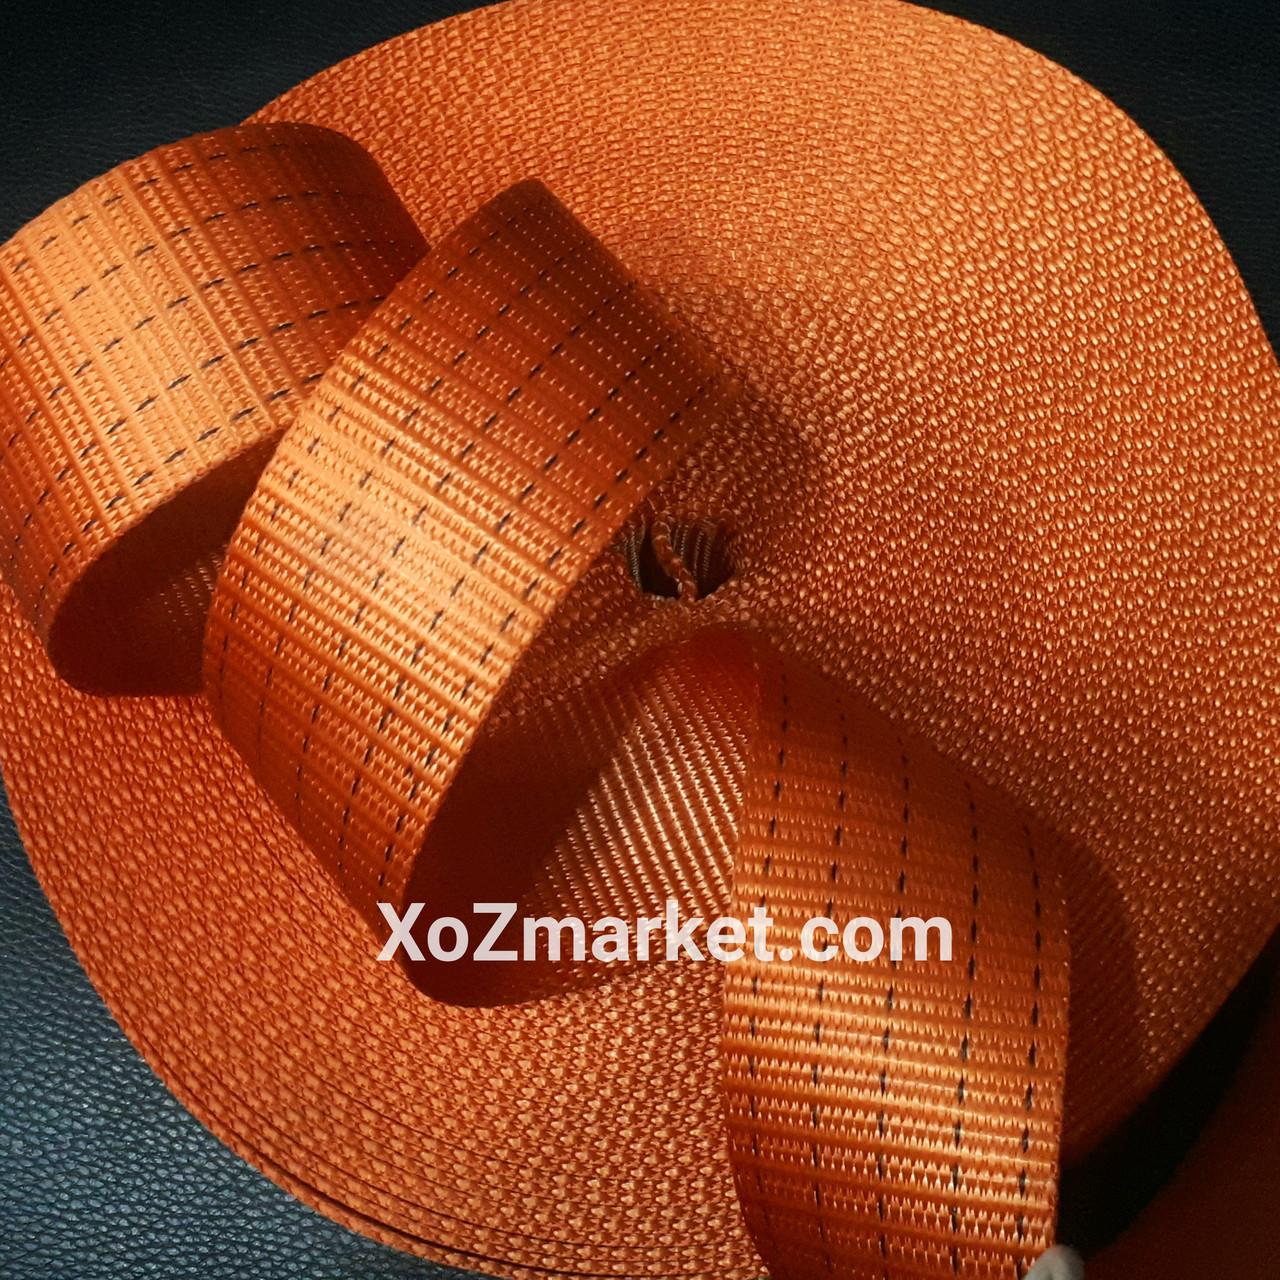 Лента полиэстеровая 5т х 25м х 50мм ➡️ Ременная стропа буксировочная ➡️ Лента для стяжных ремней